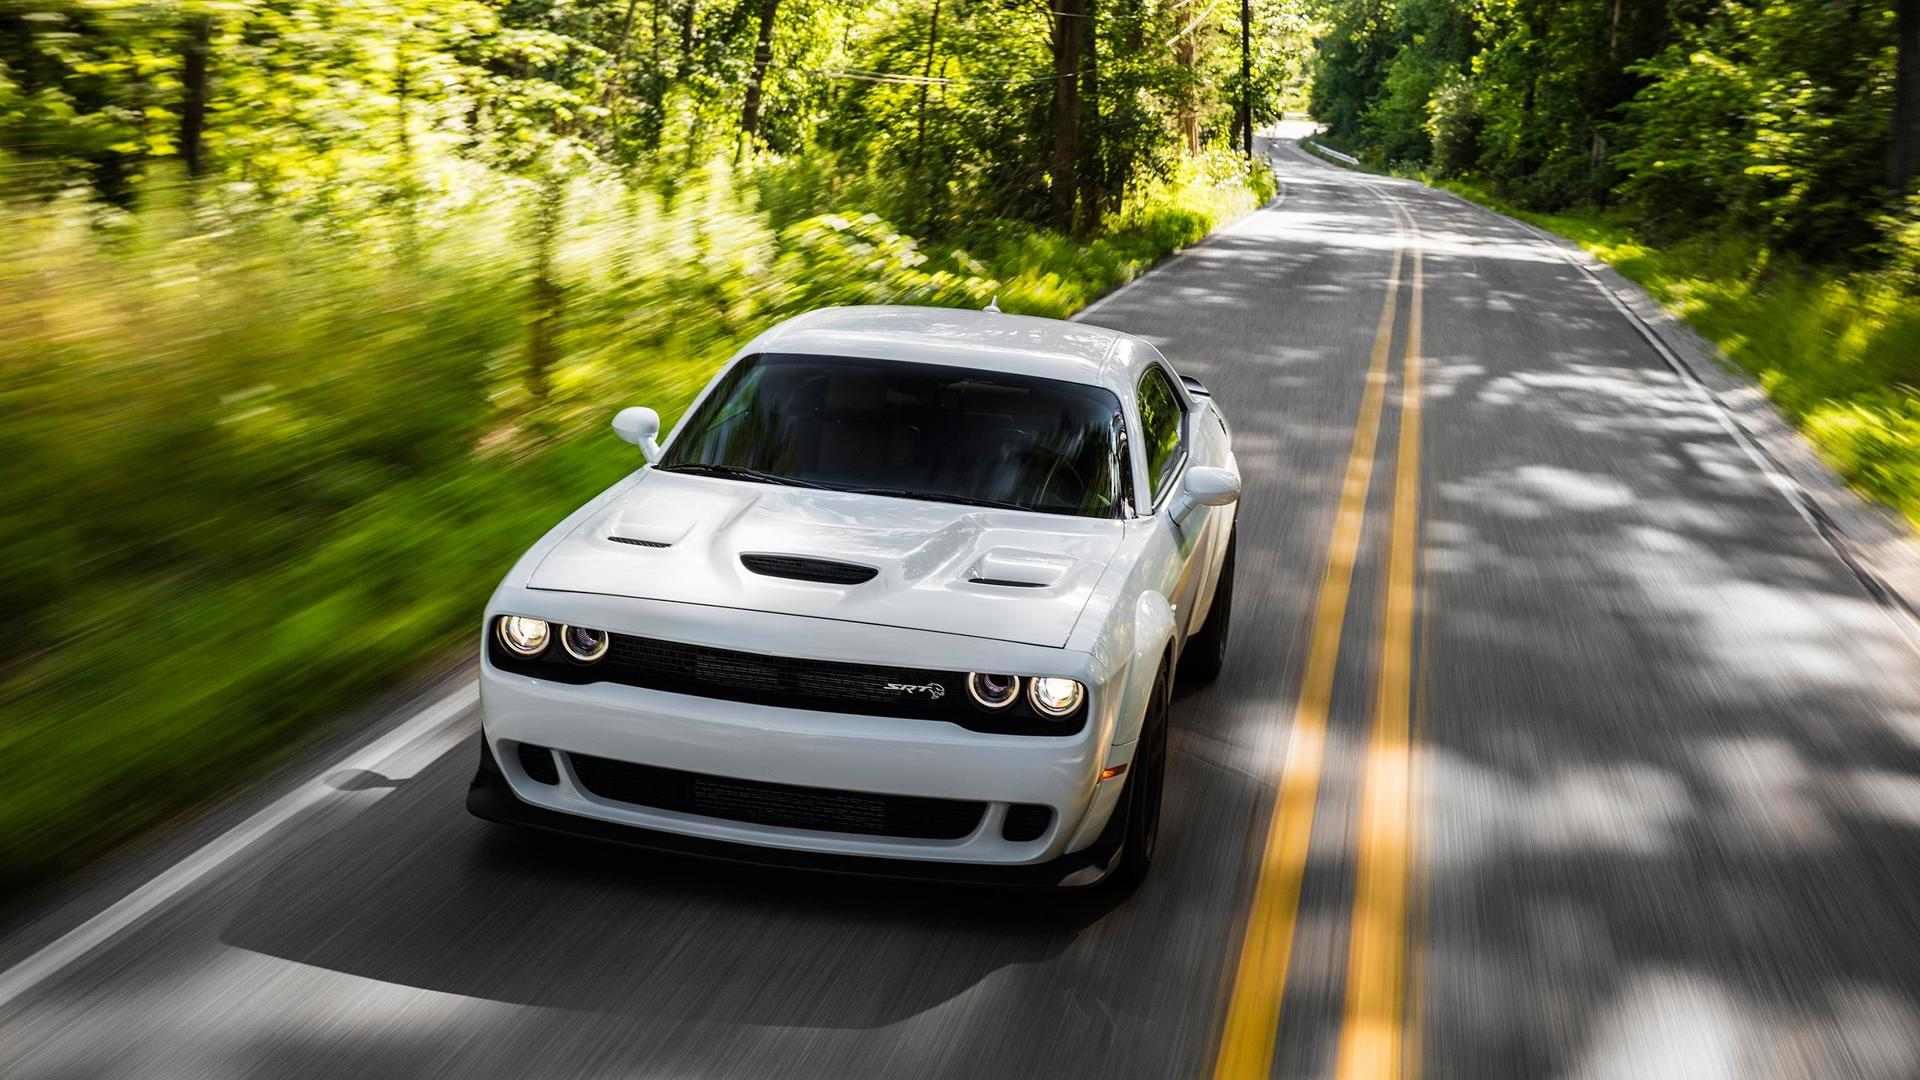 2018 Dodge Challenger Srt Hellcat Widebody Color White